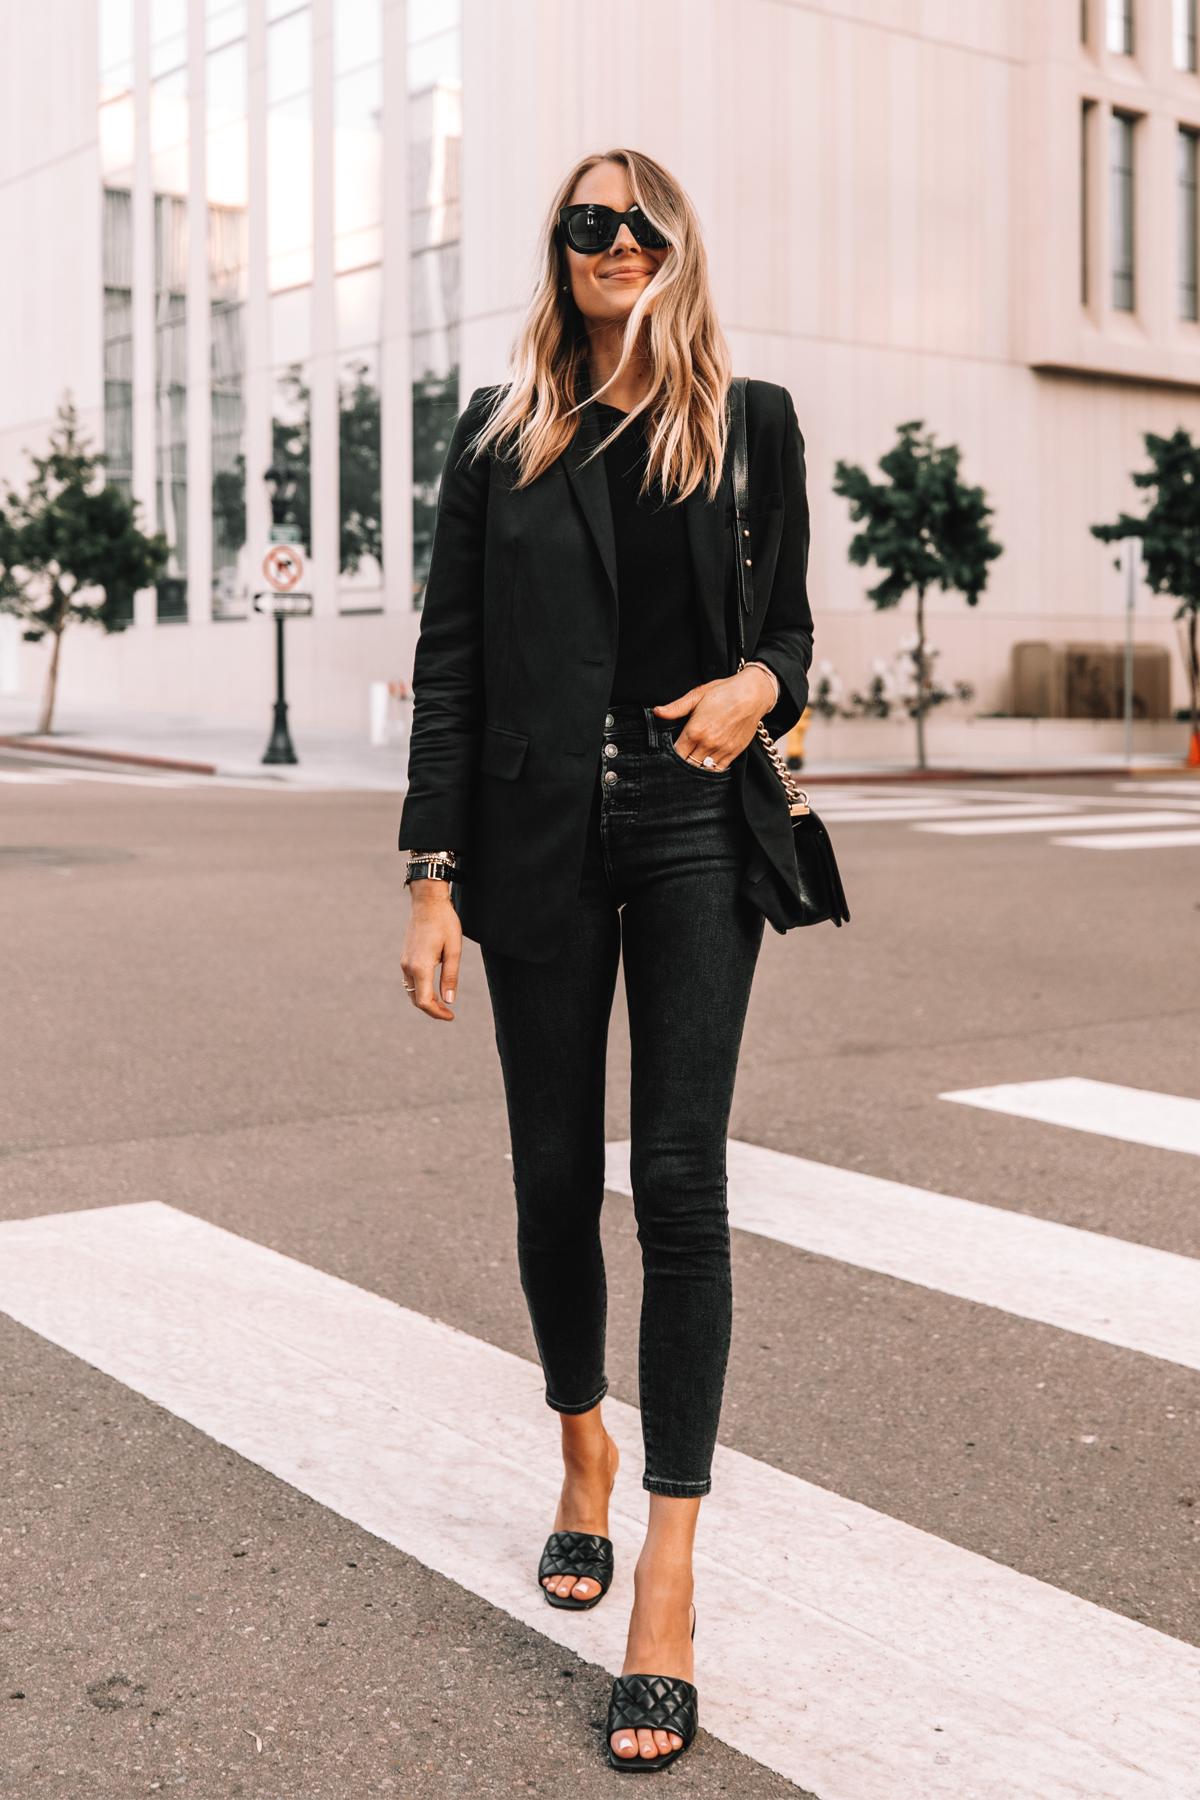 Fashion Jackson Wearing Everlane Black Blazer Everlane Black Skinny Jeans Black Heeled Sandals 1